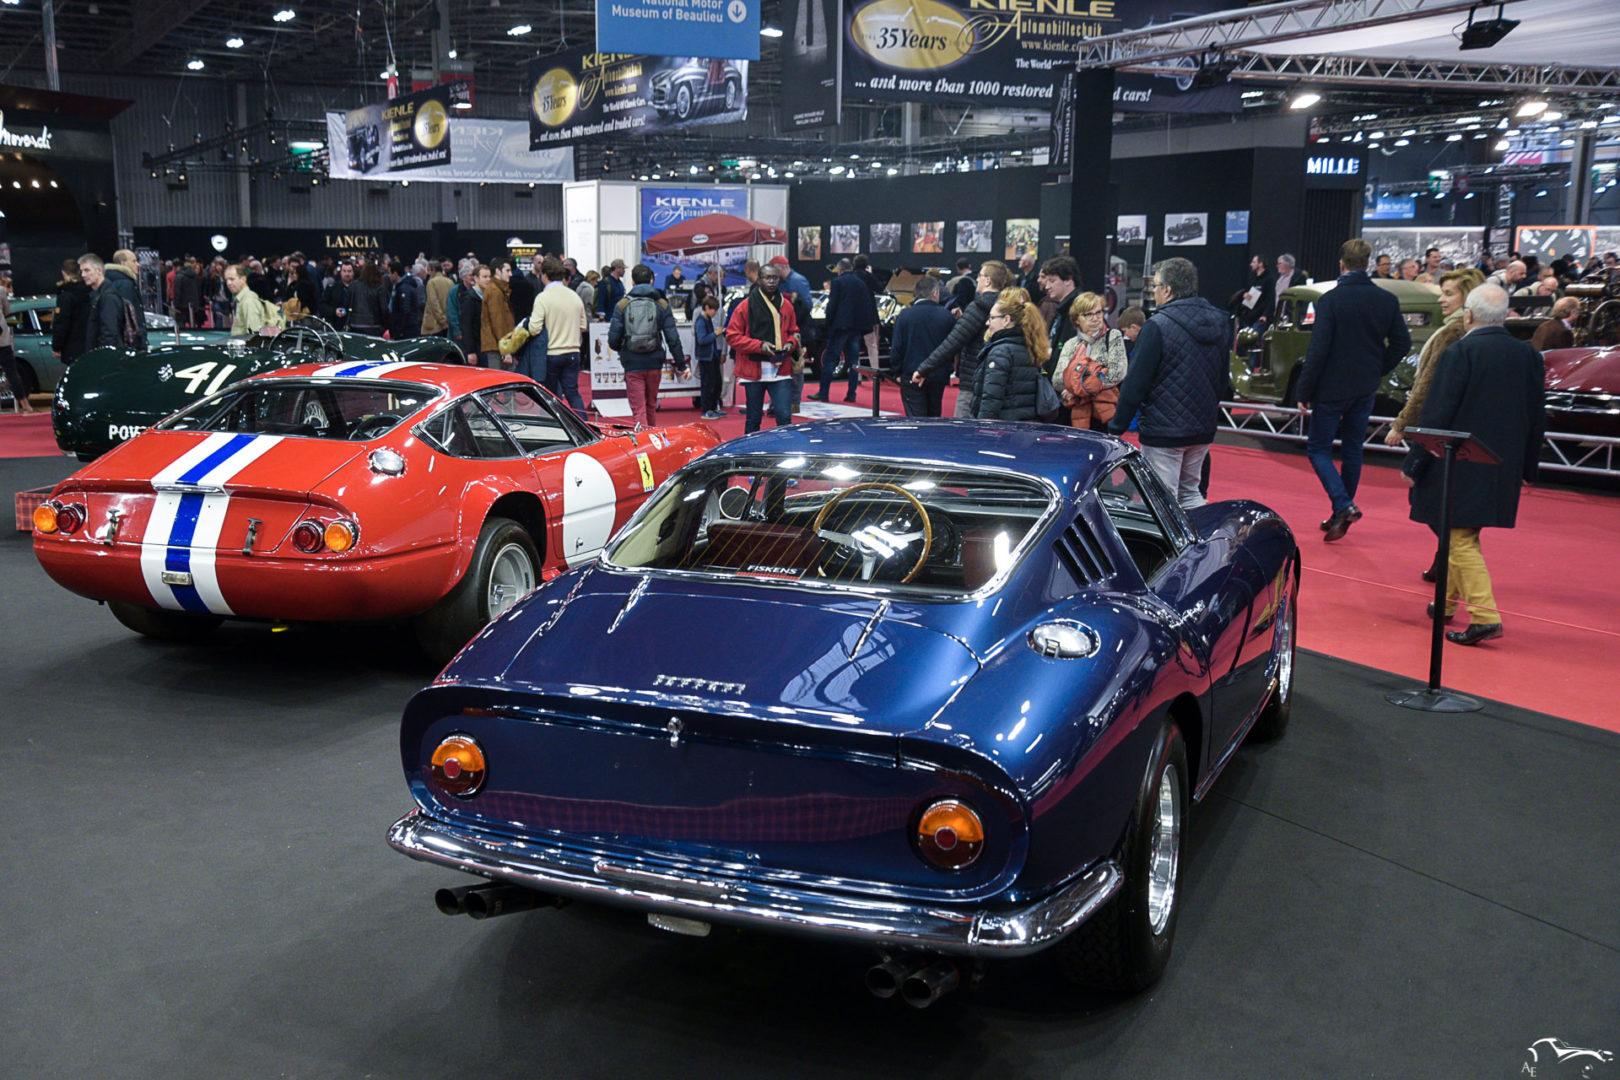 Ferrari Daytonna GR4 & 275 GTB